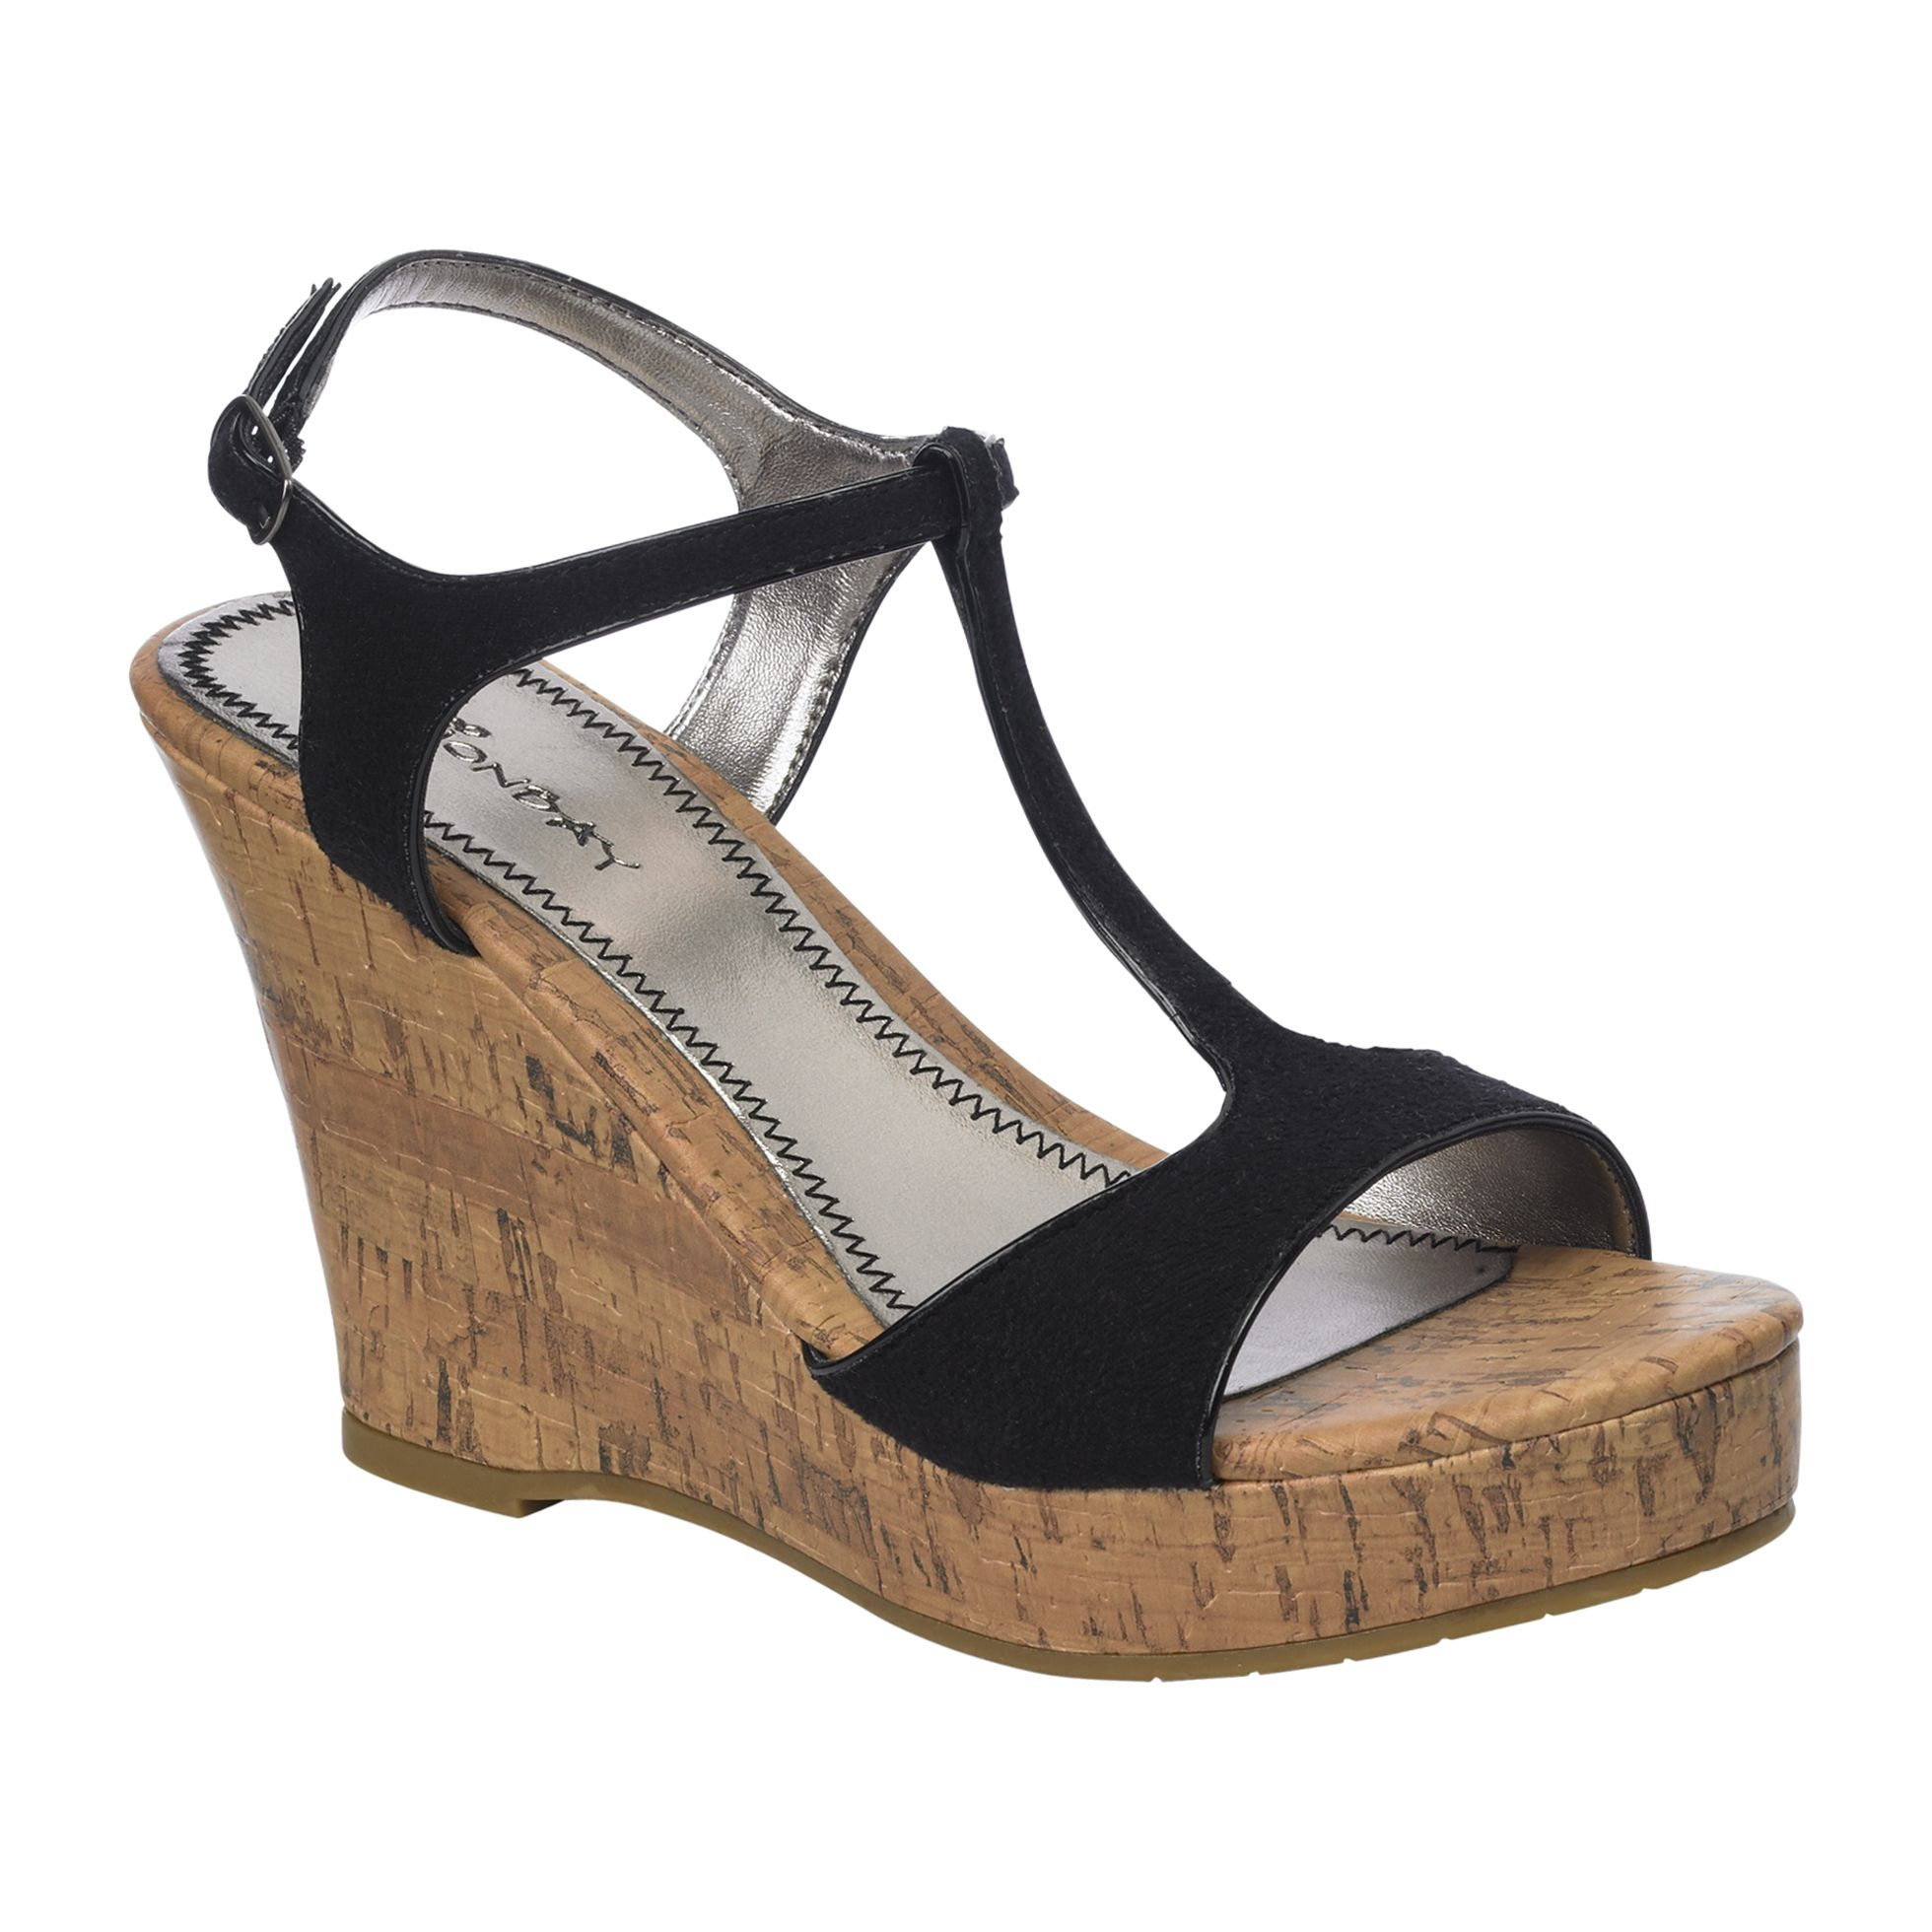 Unionbay Women' Diva - Black Clothing Shoes & Jewelry